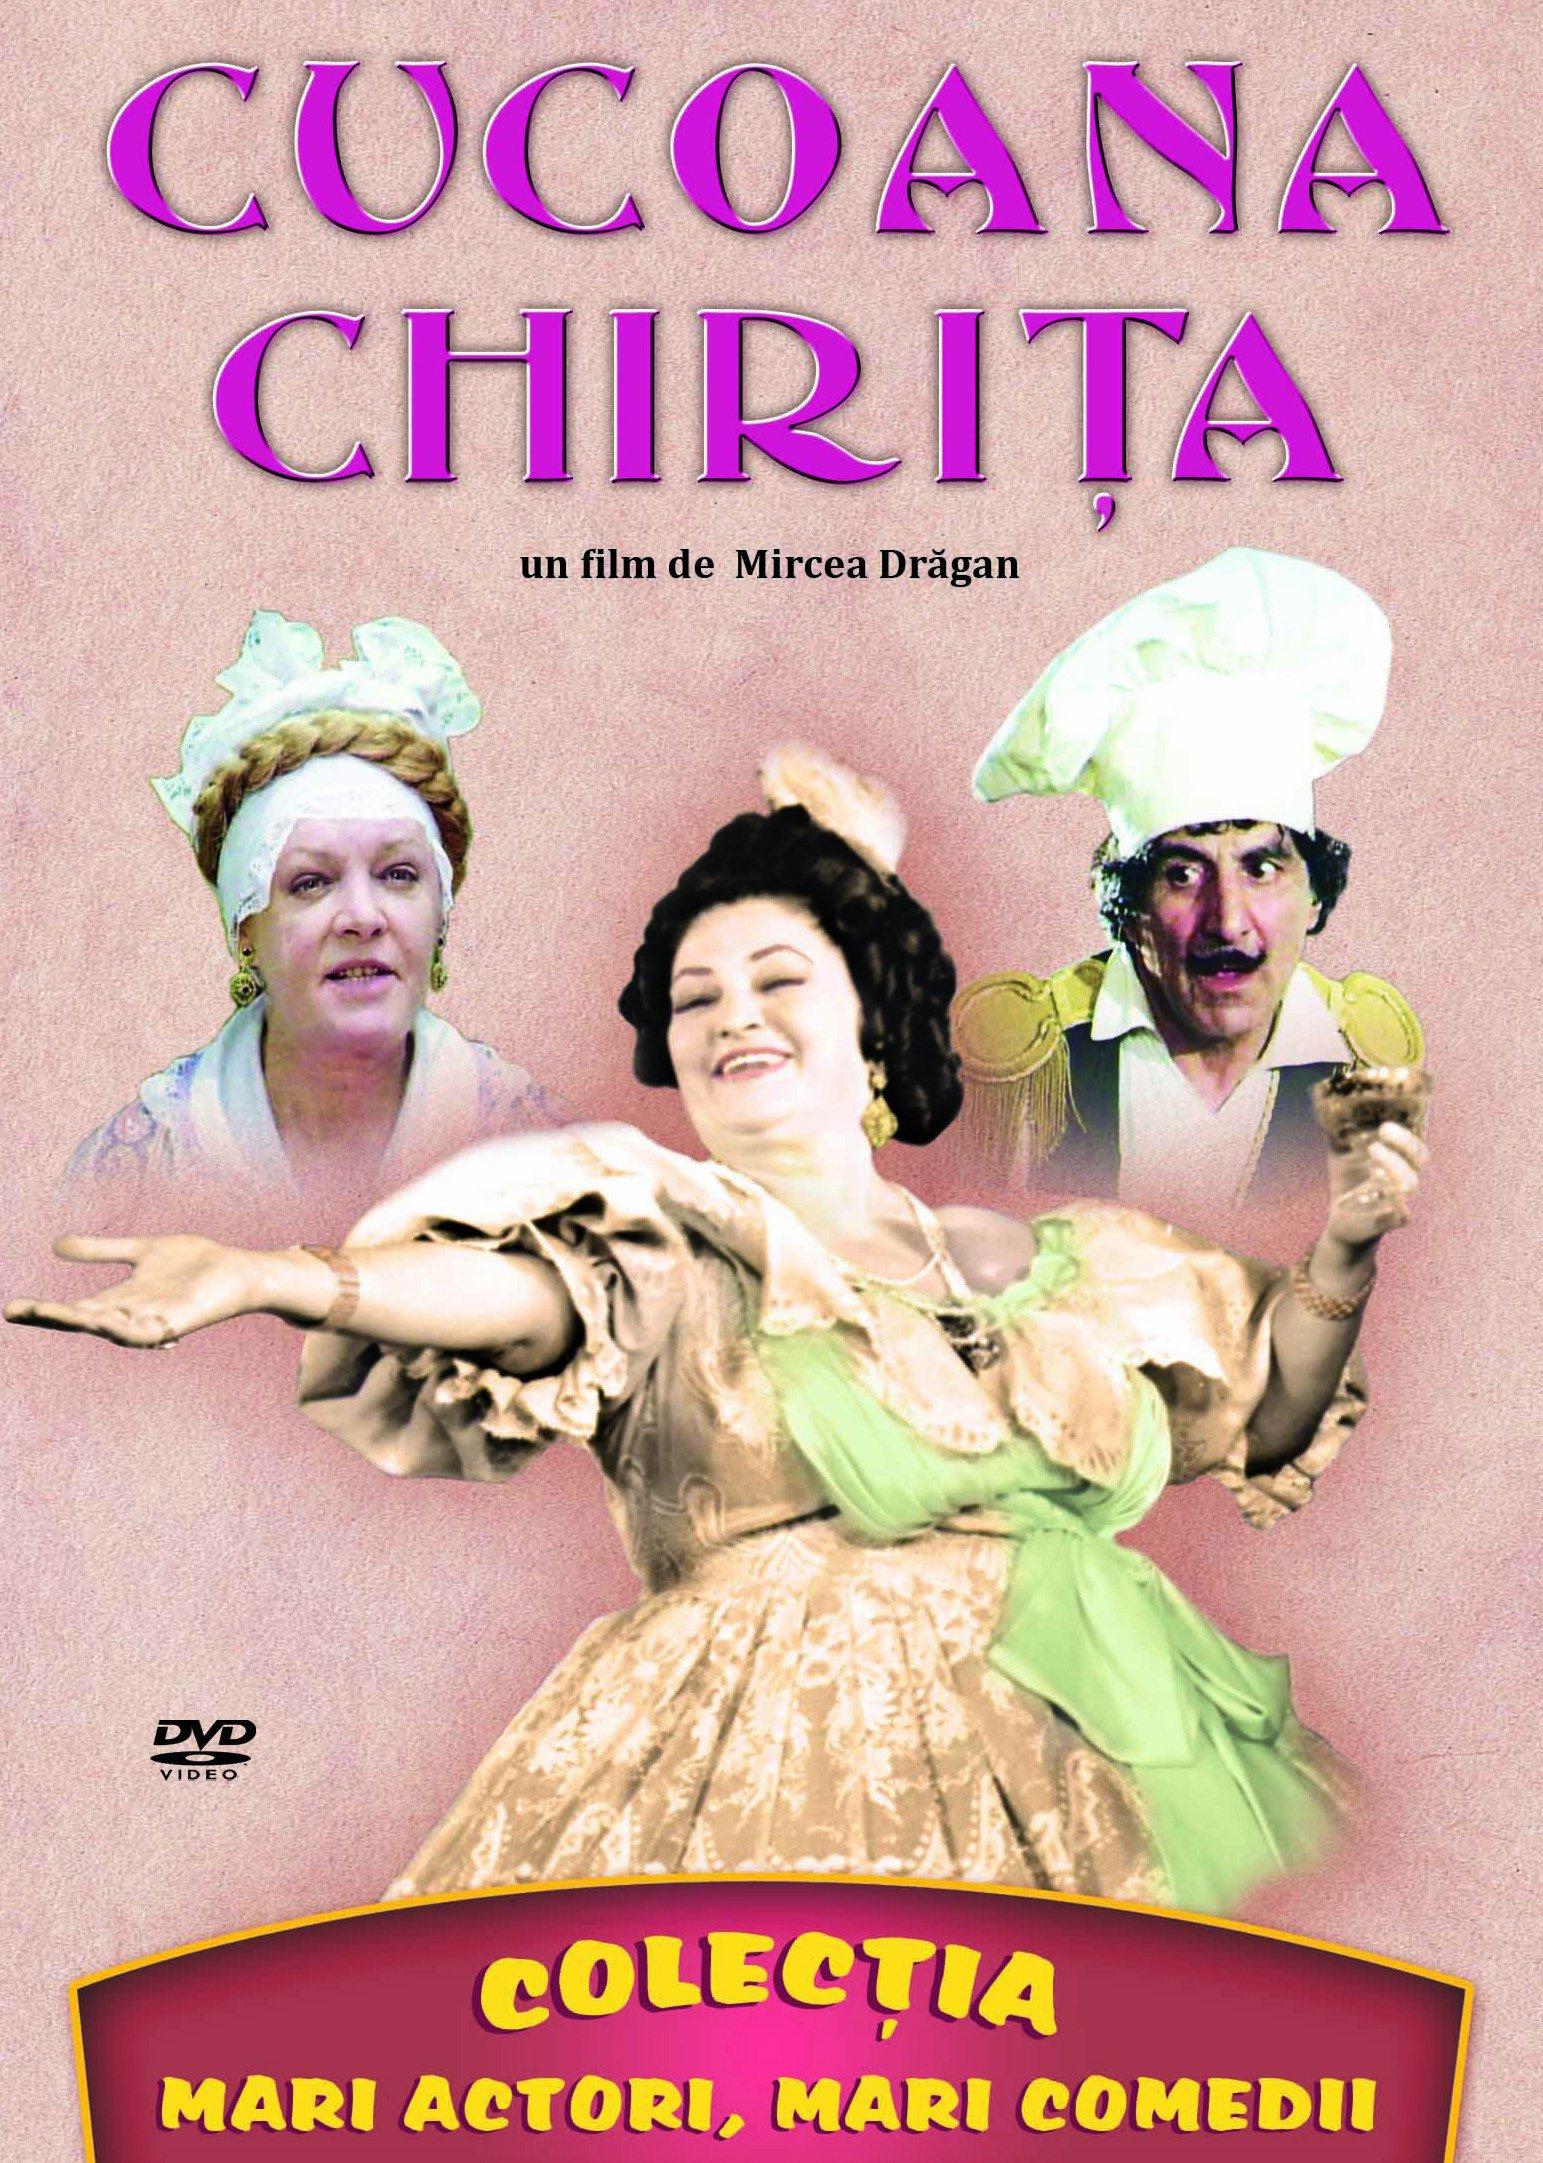 Coana chirita in provincie online dating